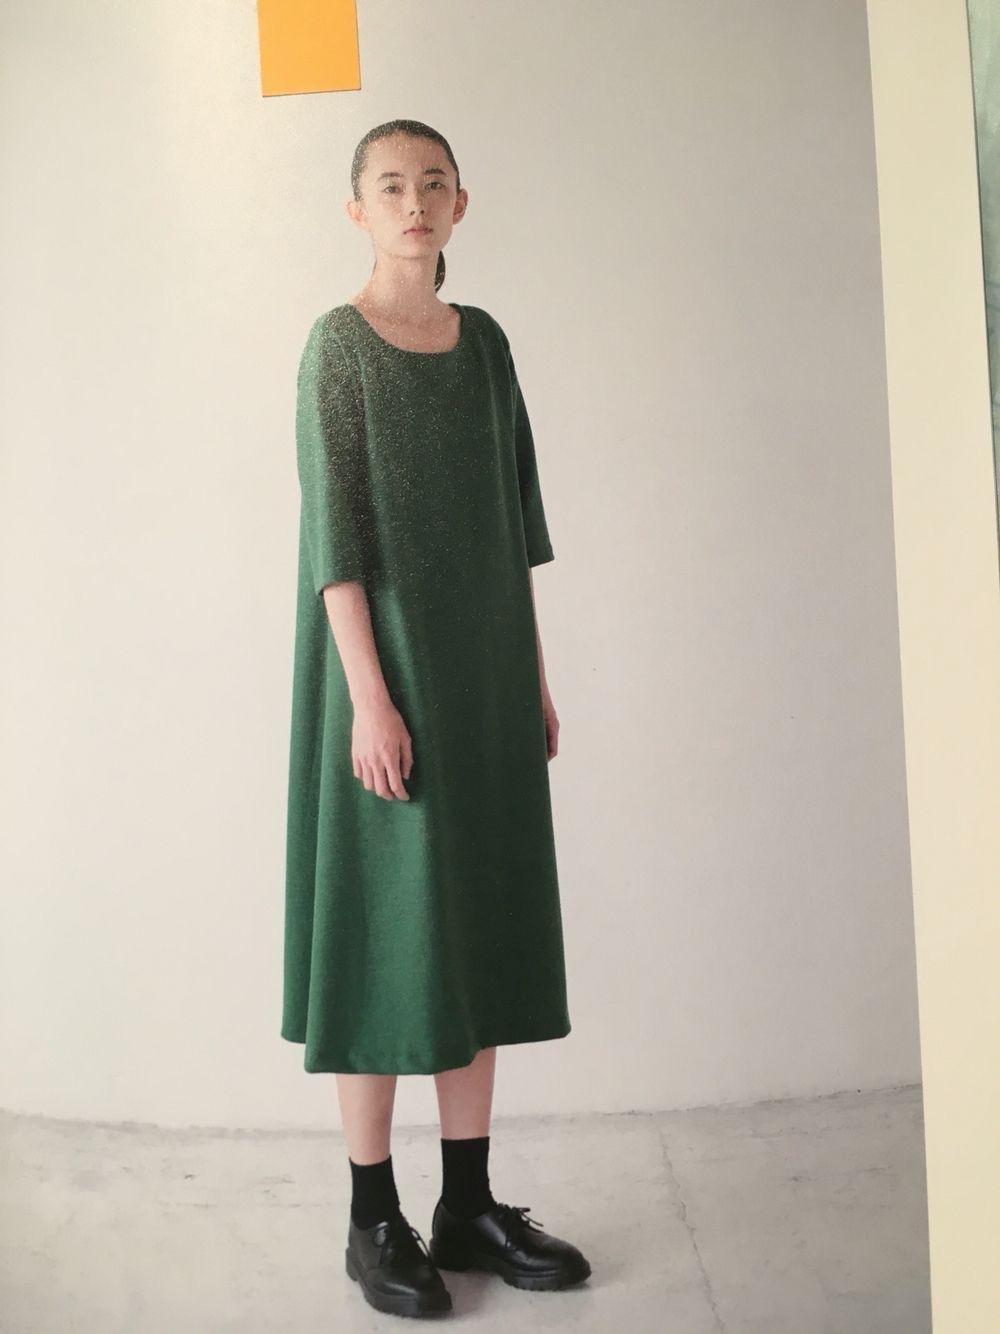 Simple Green Dress Simple Green Dress Clothes Green Dress [ 1334 x 1000 Pixel ]